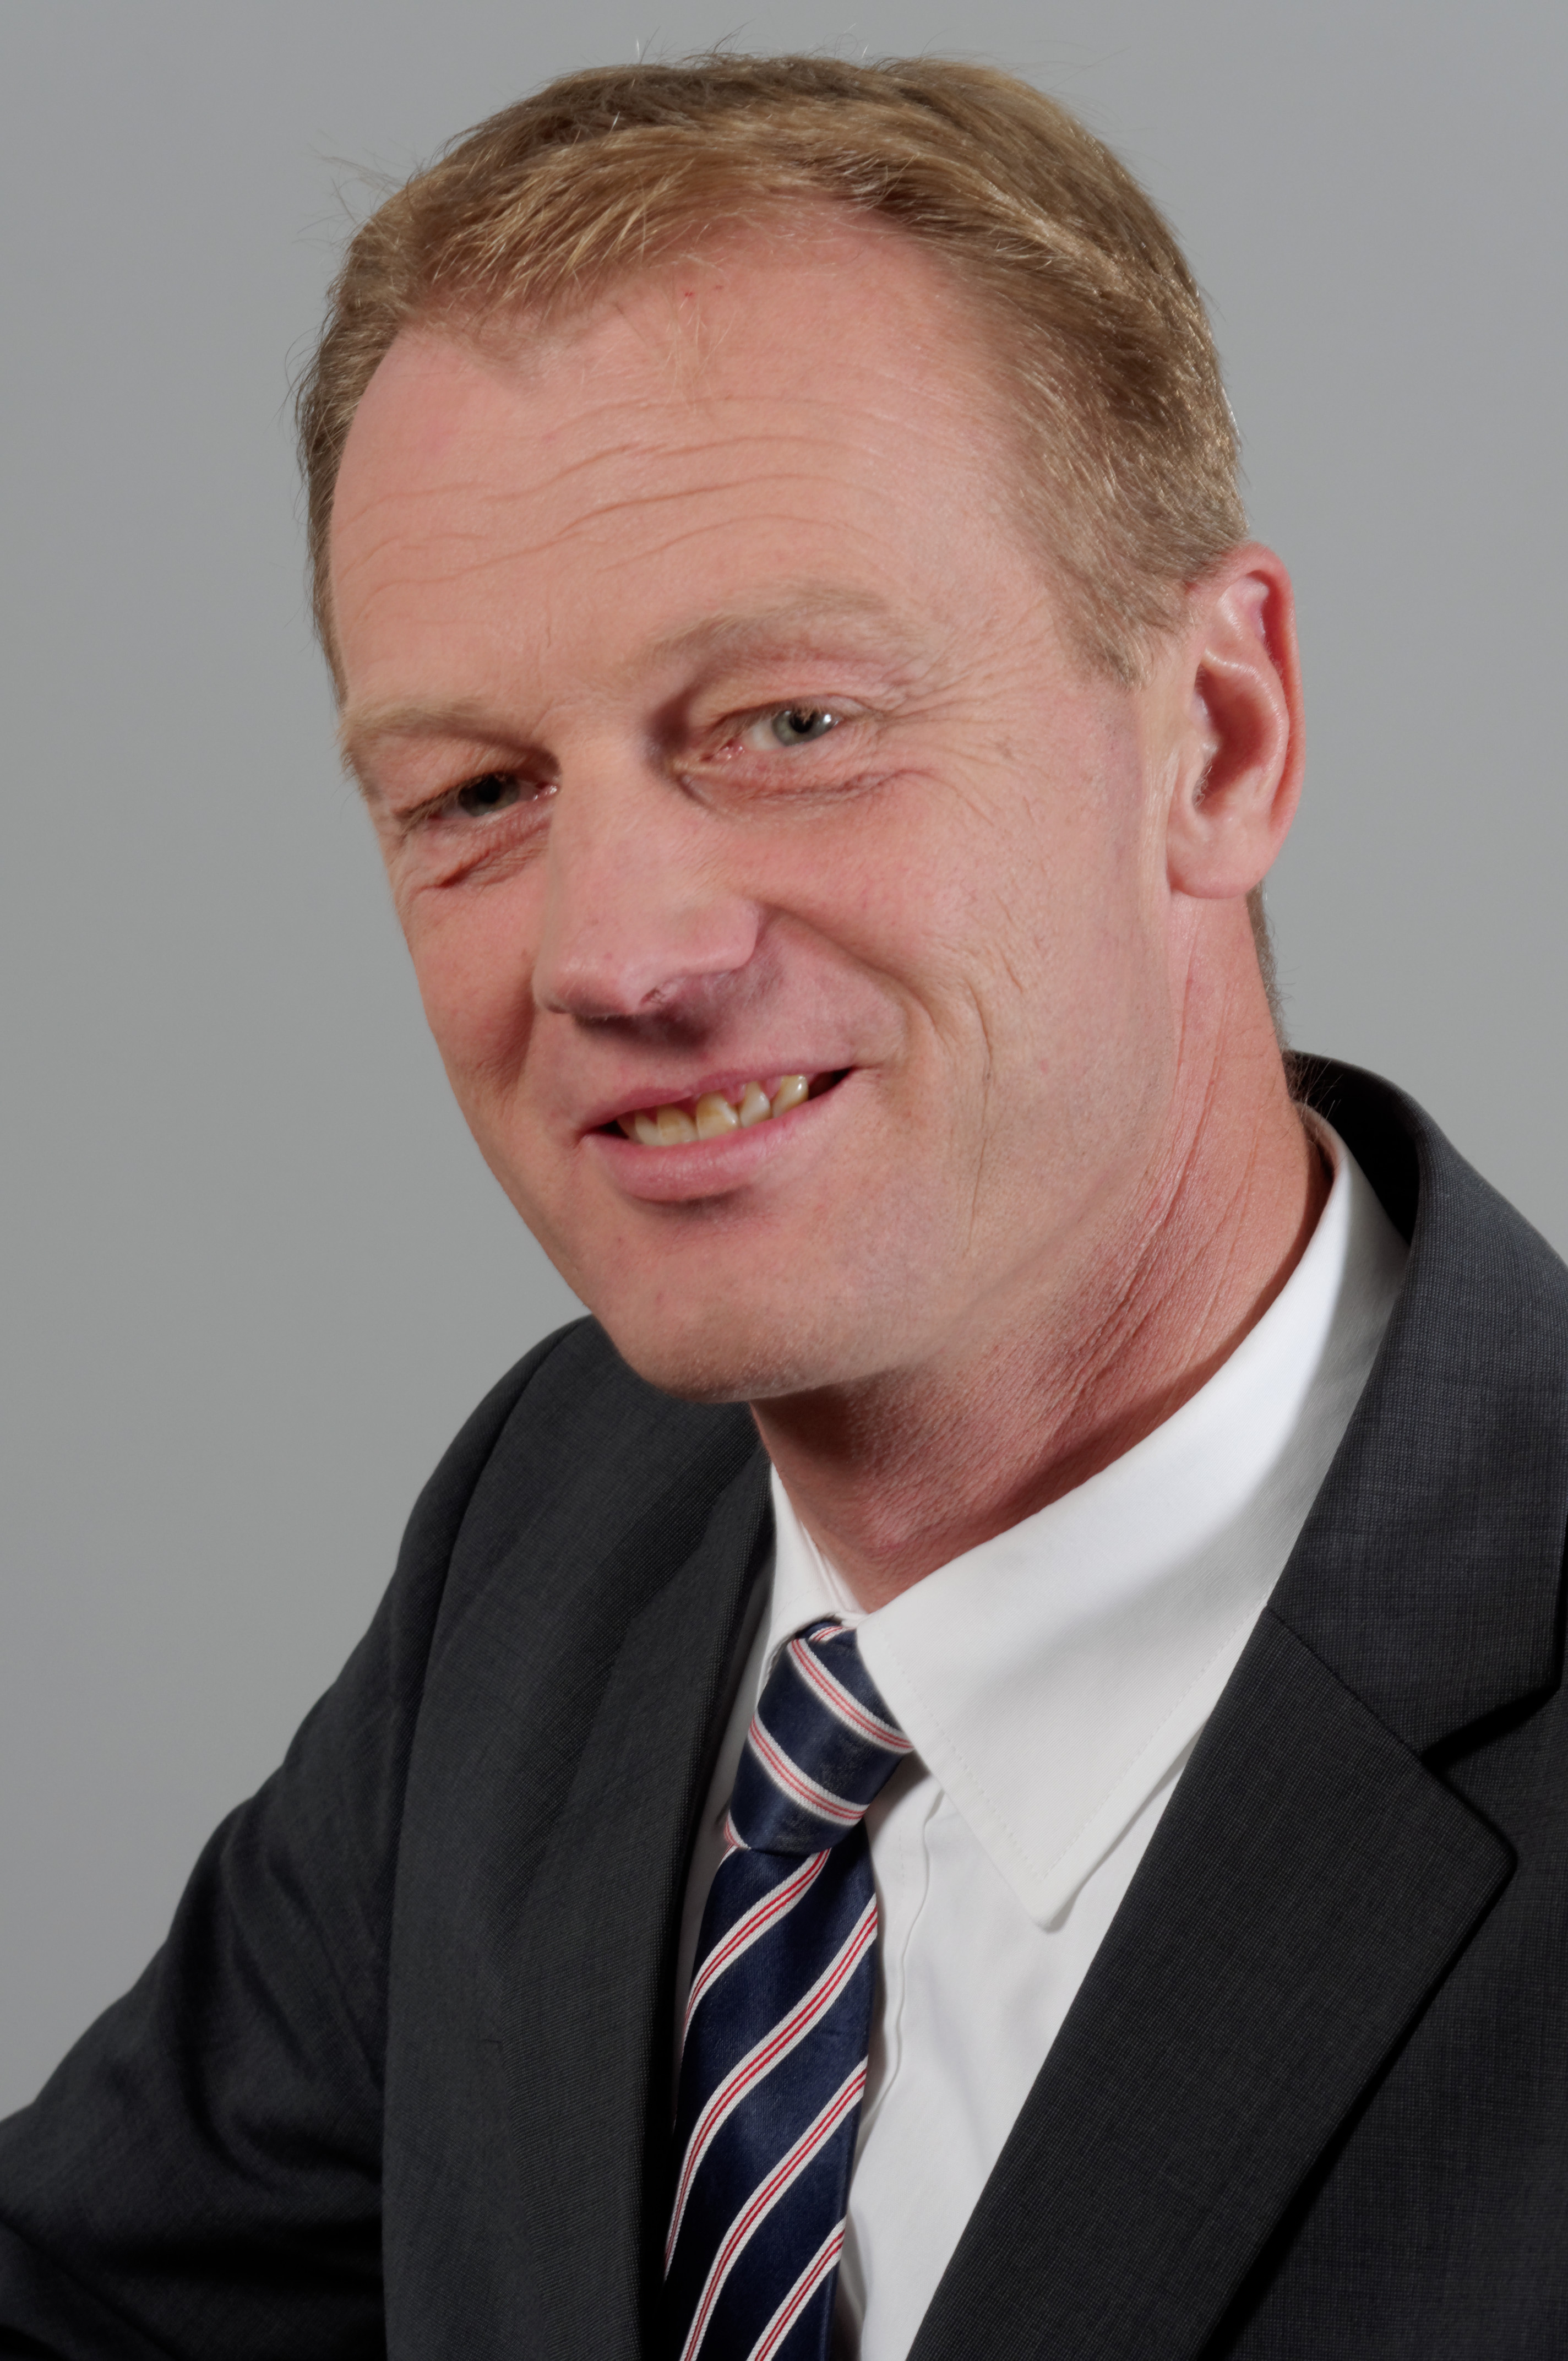 Johannes Callsen